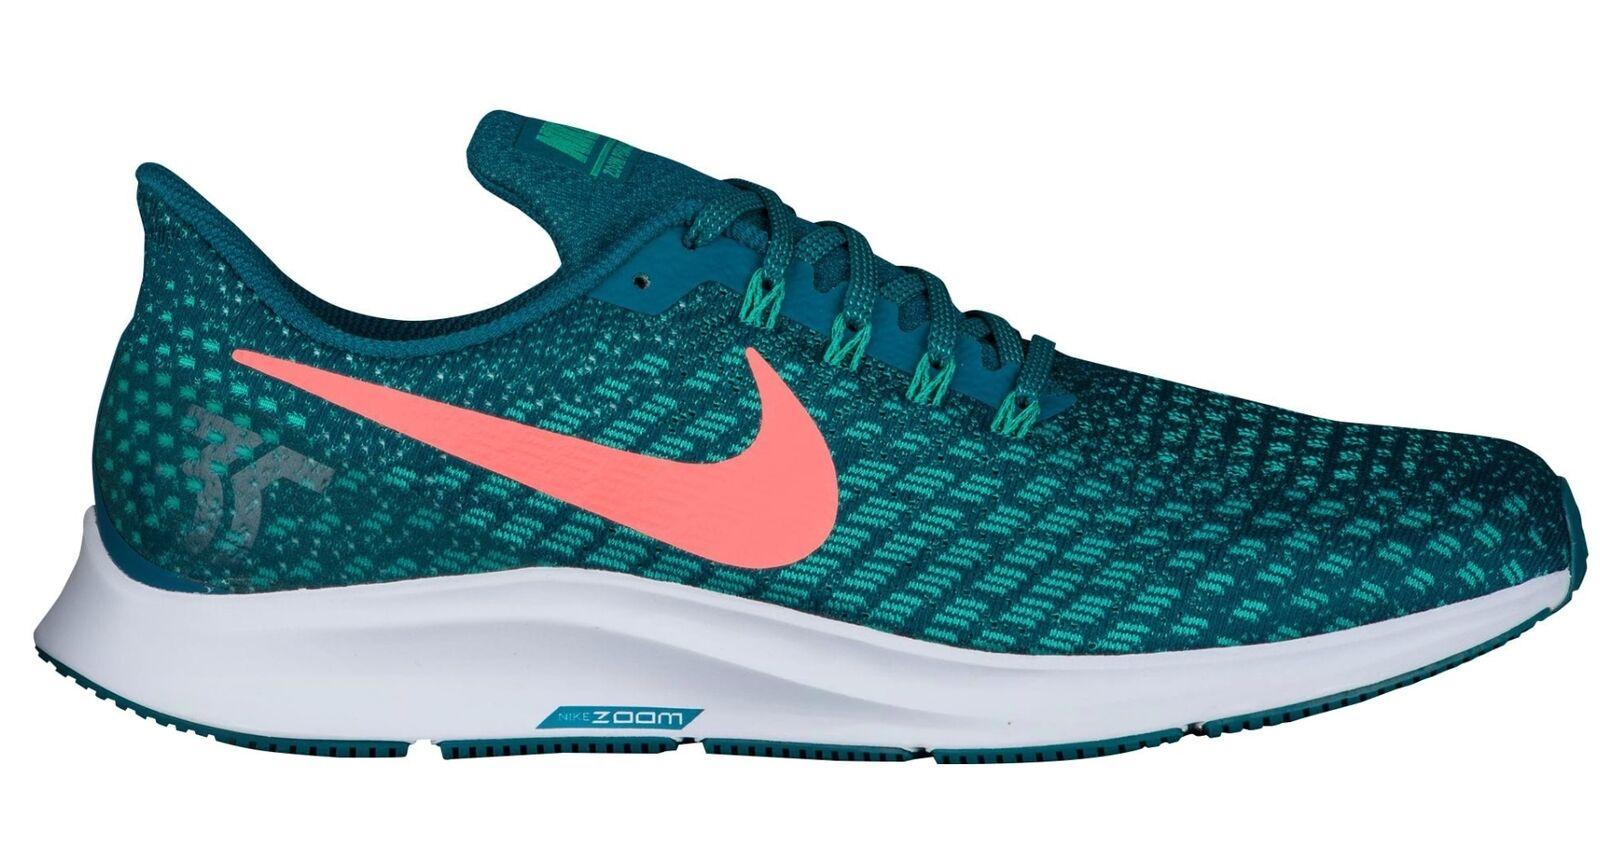 Nike Air Zoom Pegasus 35 Mens 942851-300 Geode Teal Mesh Running Shoes Size 13